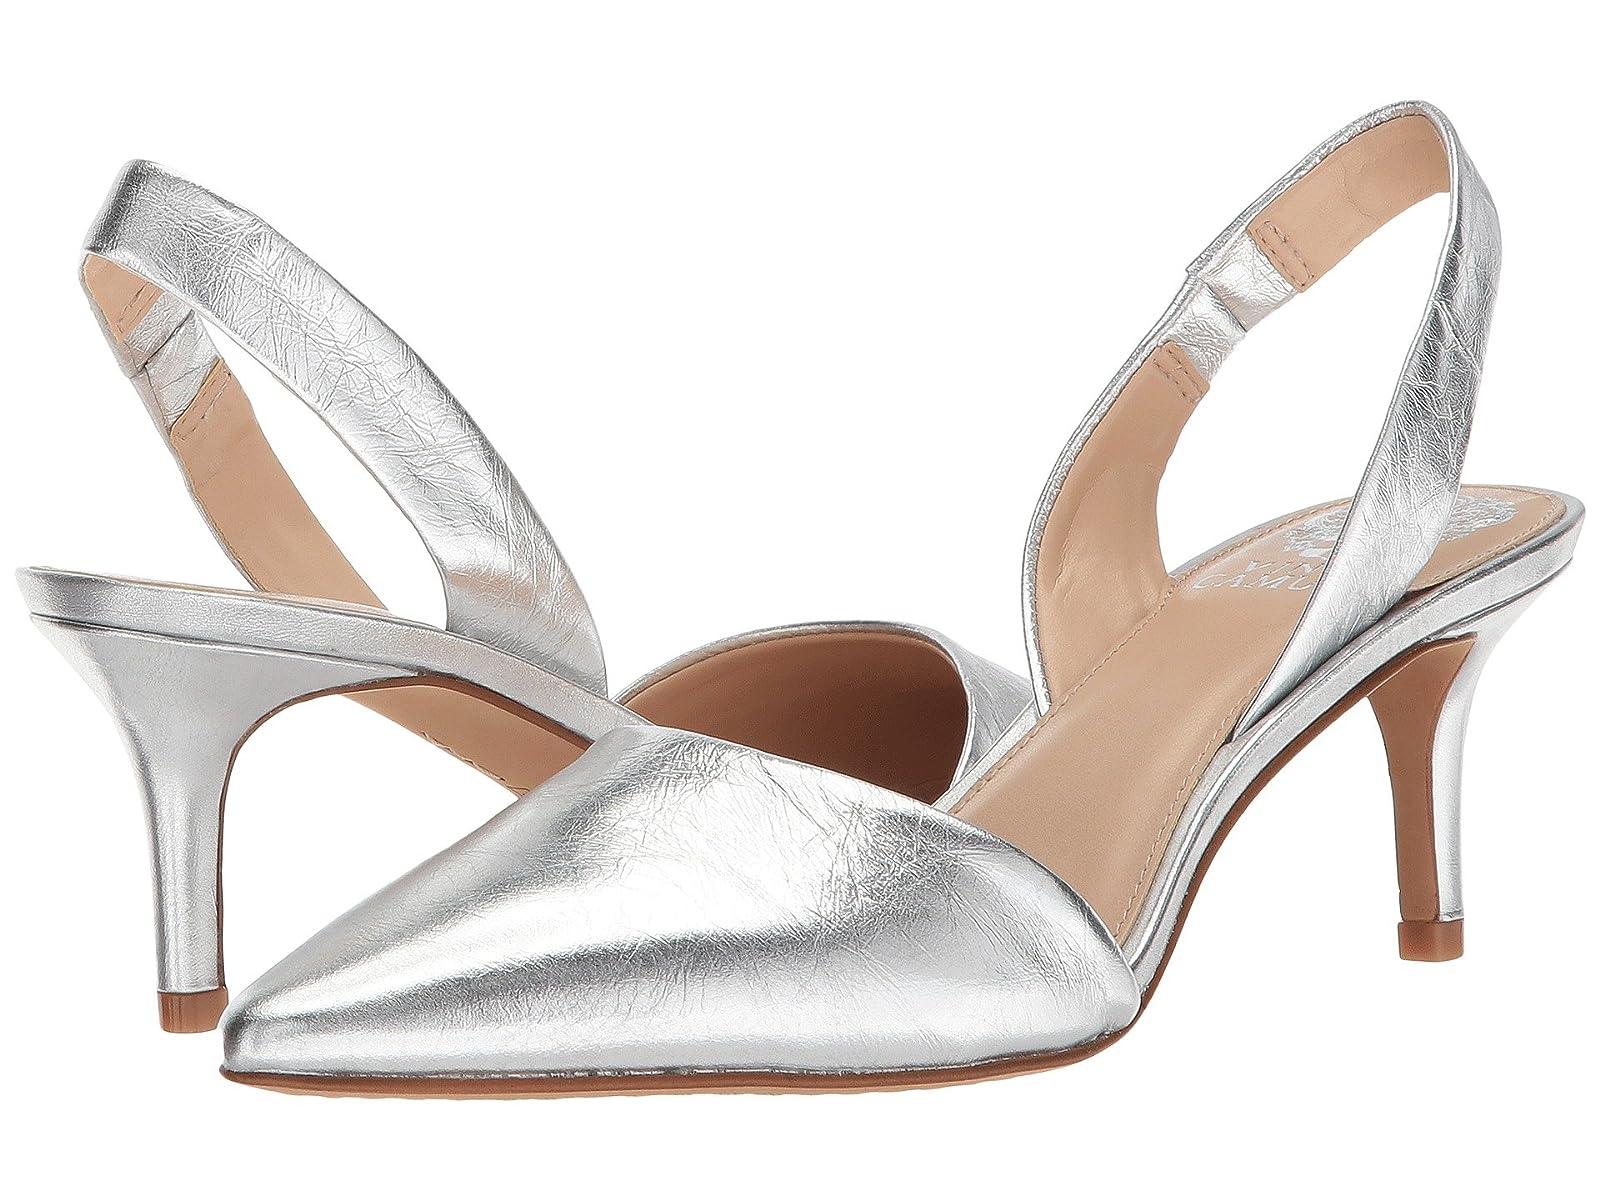 Vince Camuto KolissaCheap and distinctive eye-catching shoes